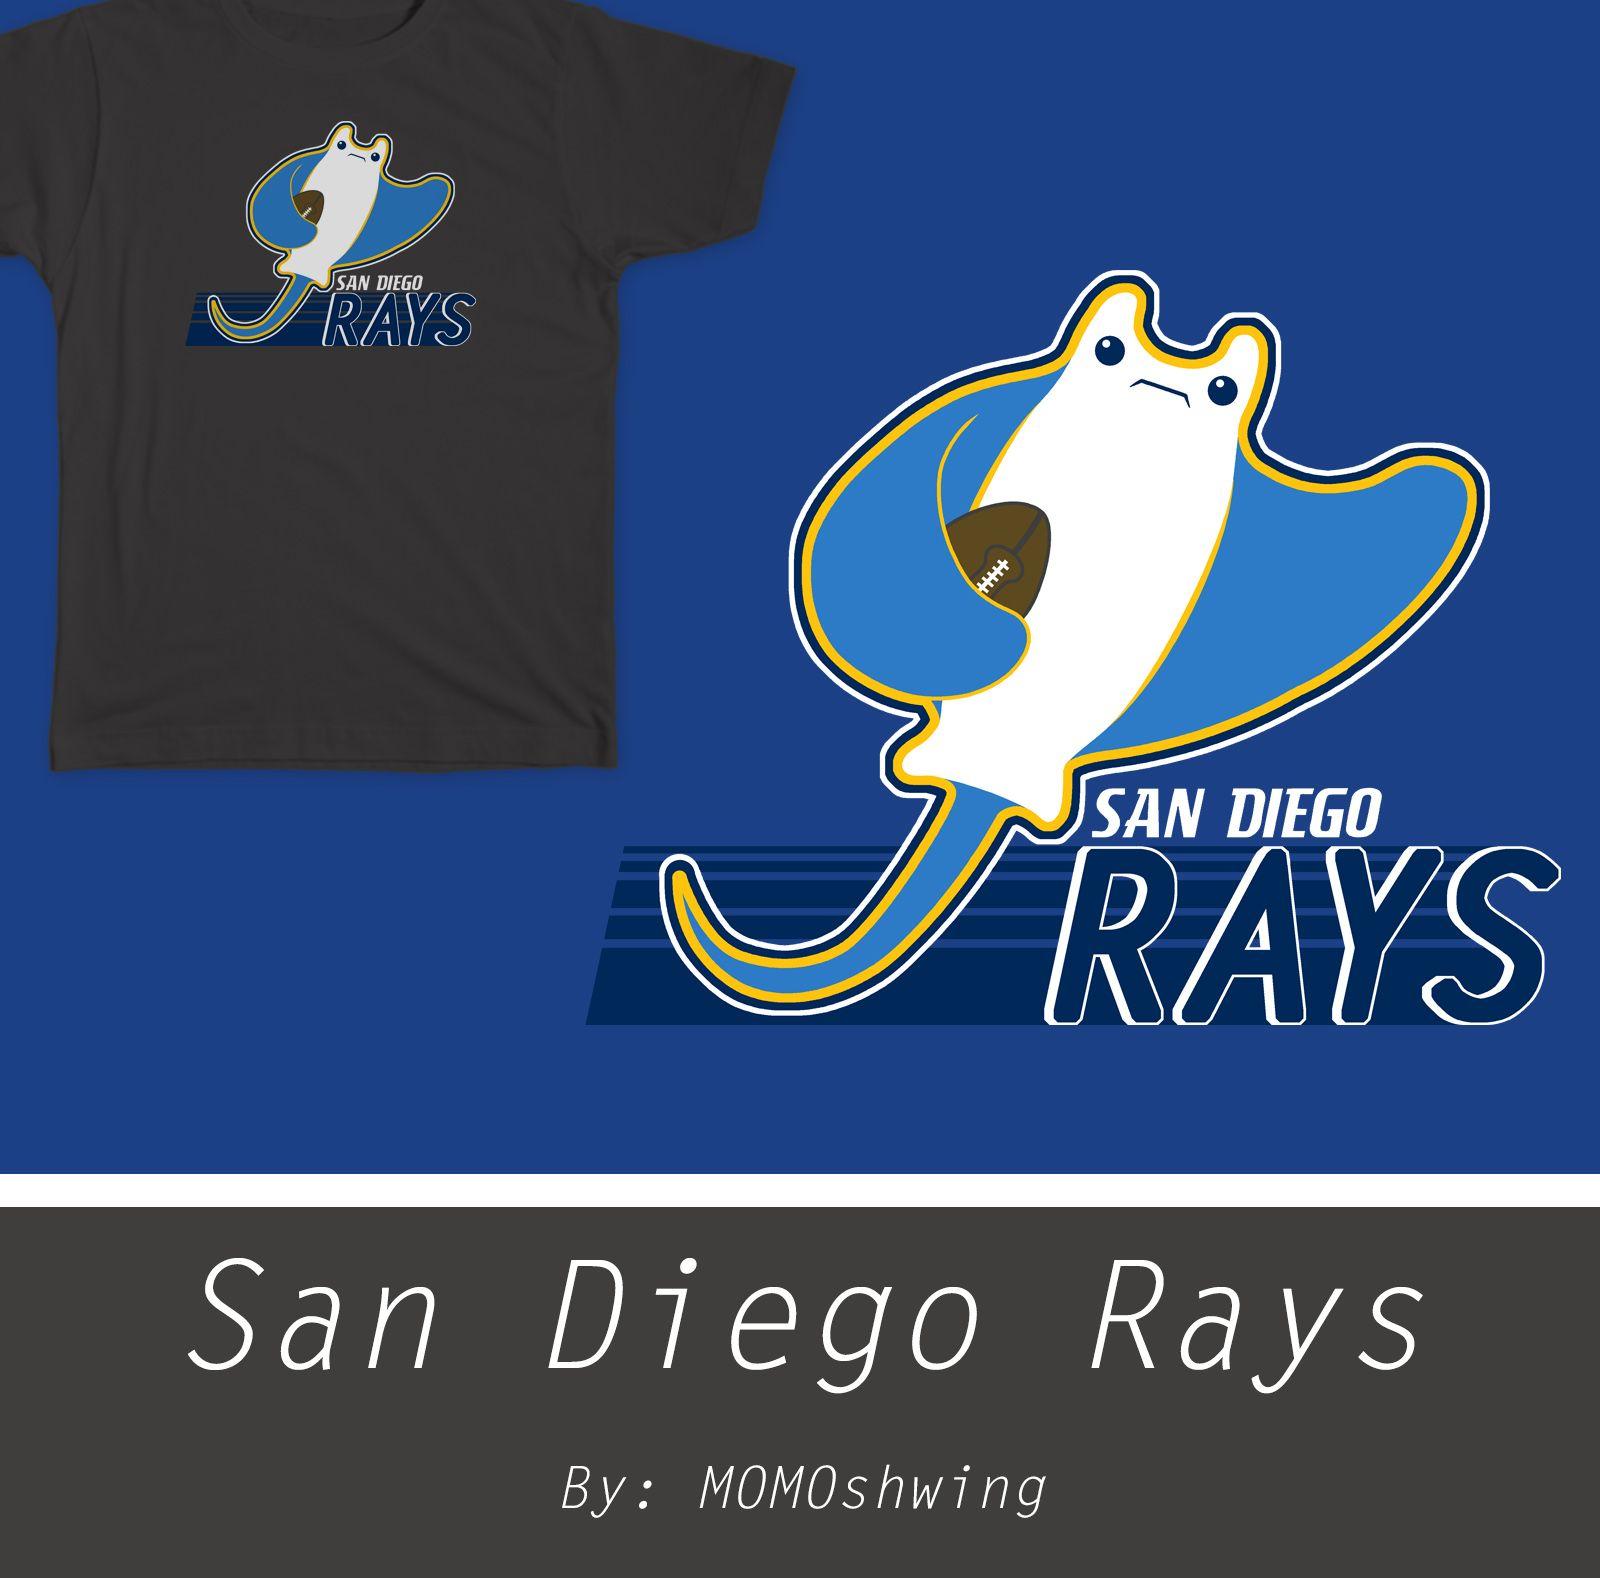 Shirt design san diego - San Diego Rays Nfl Football Fantasyfootball Shirt Design